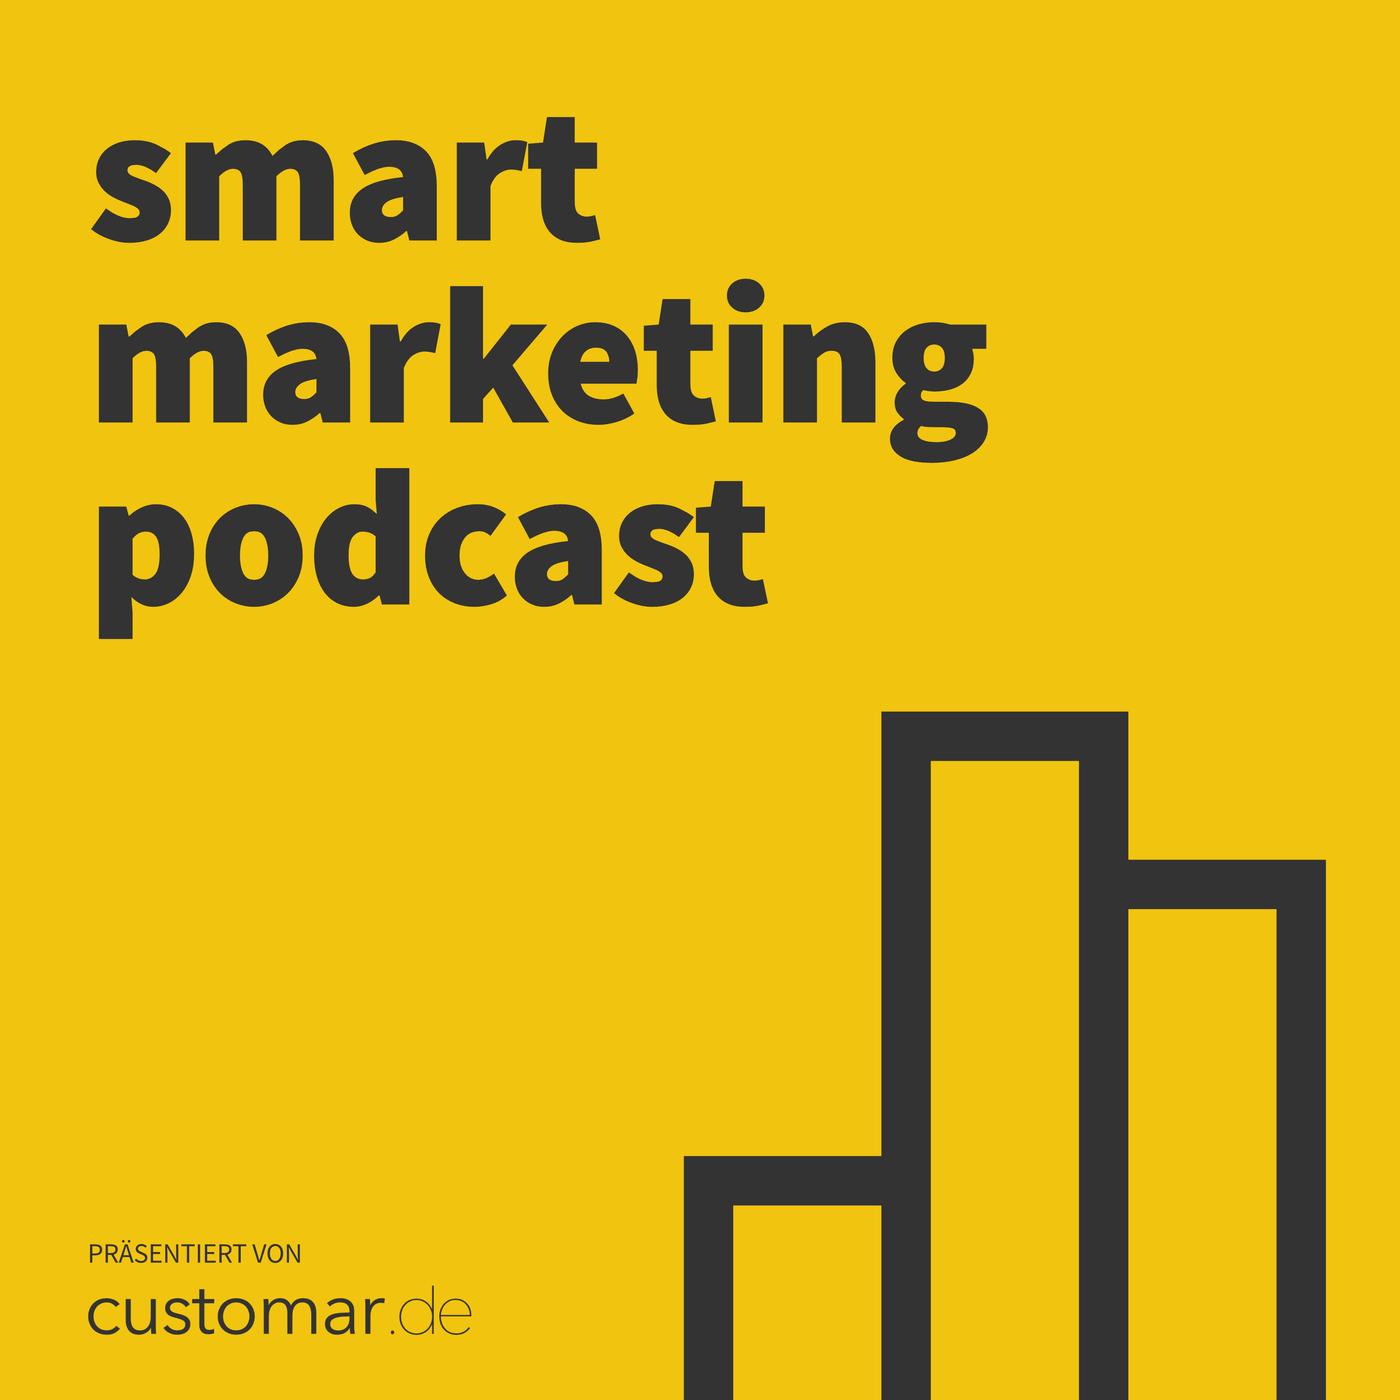 Smart Marketing Podcast